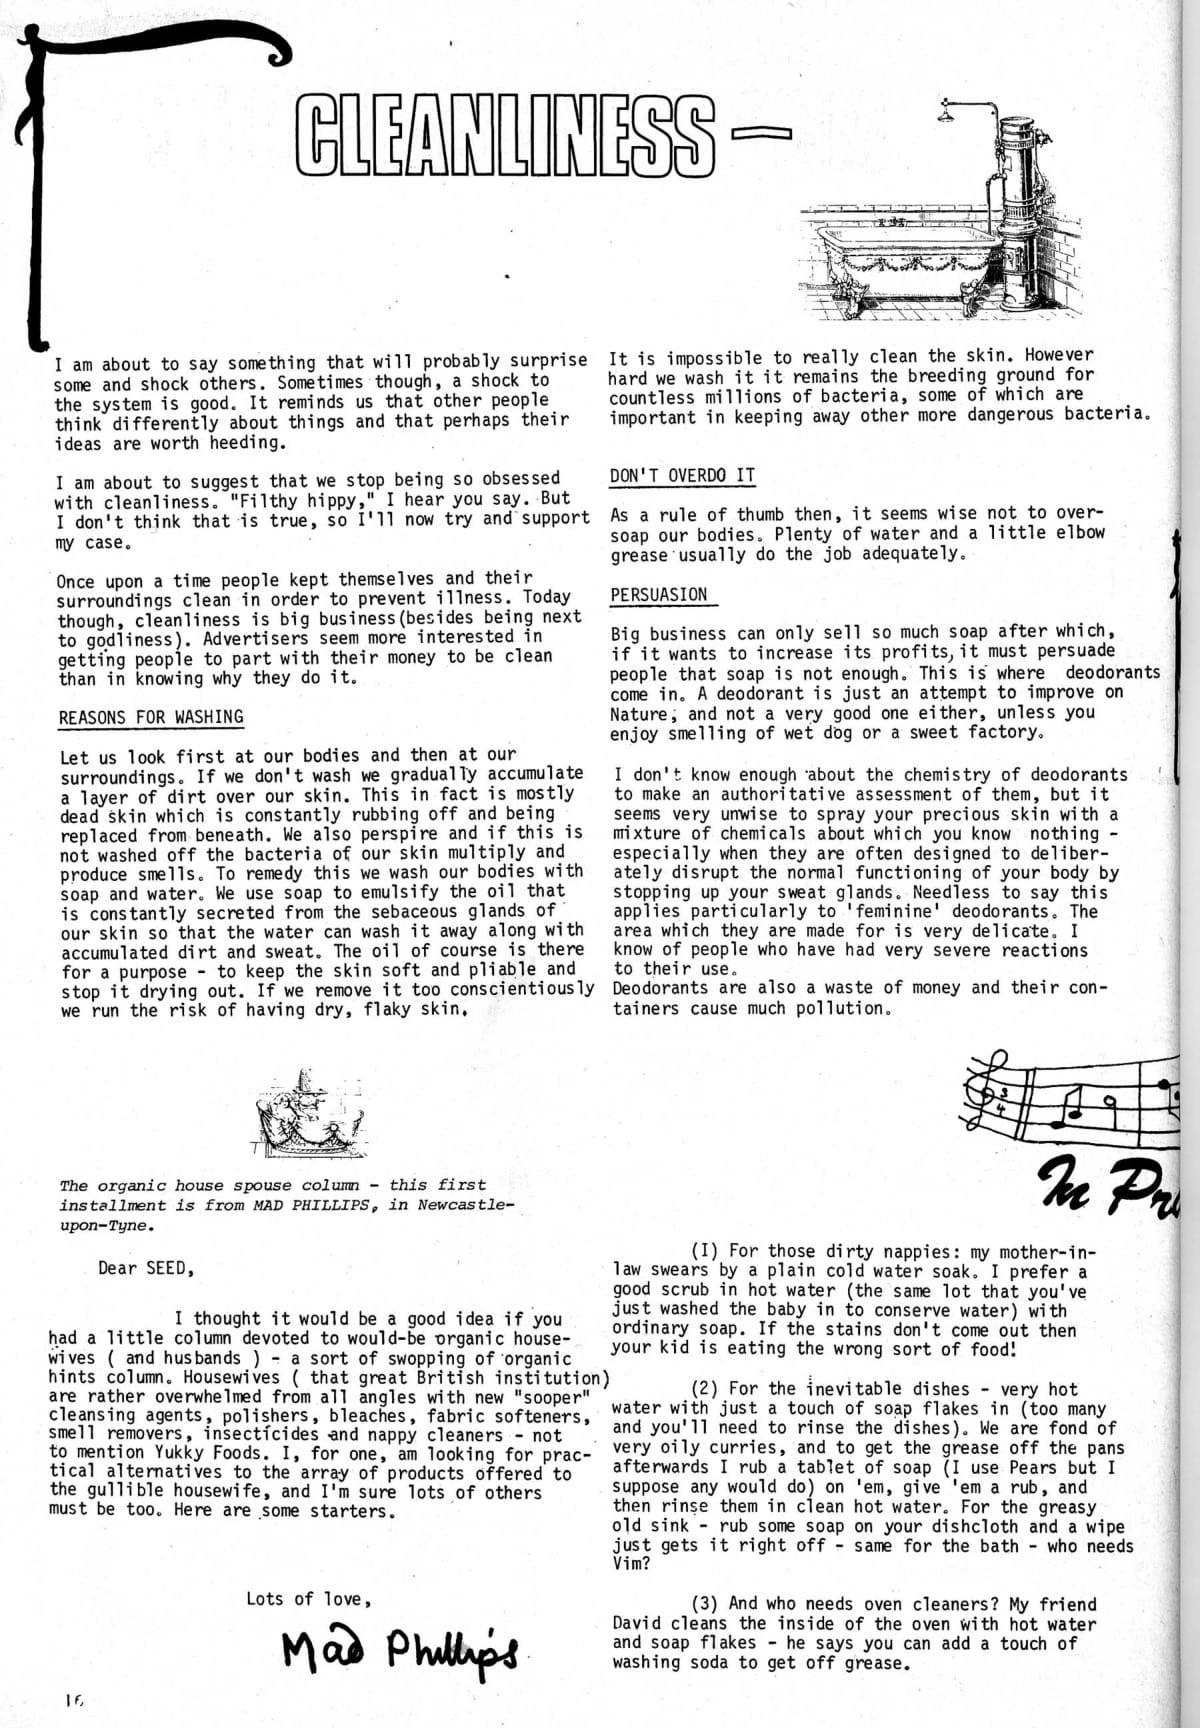 seed-v3-n6-june1974-16.jpg